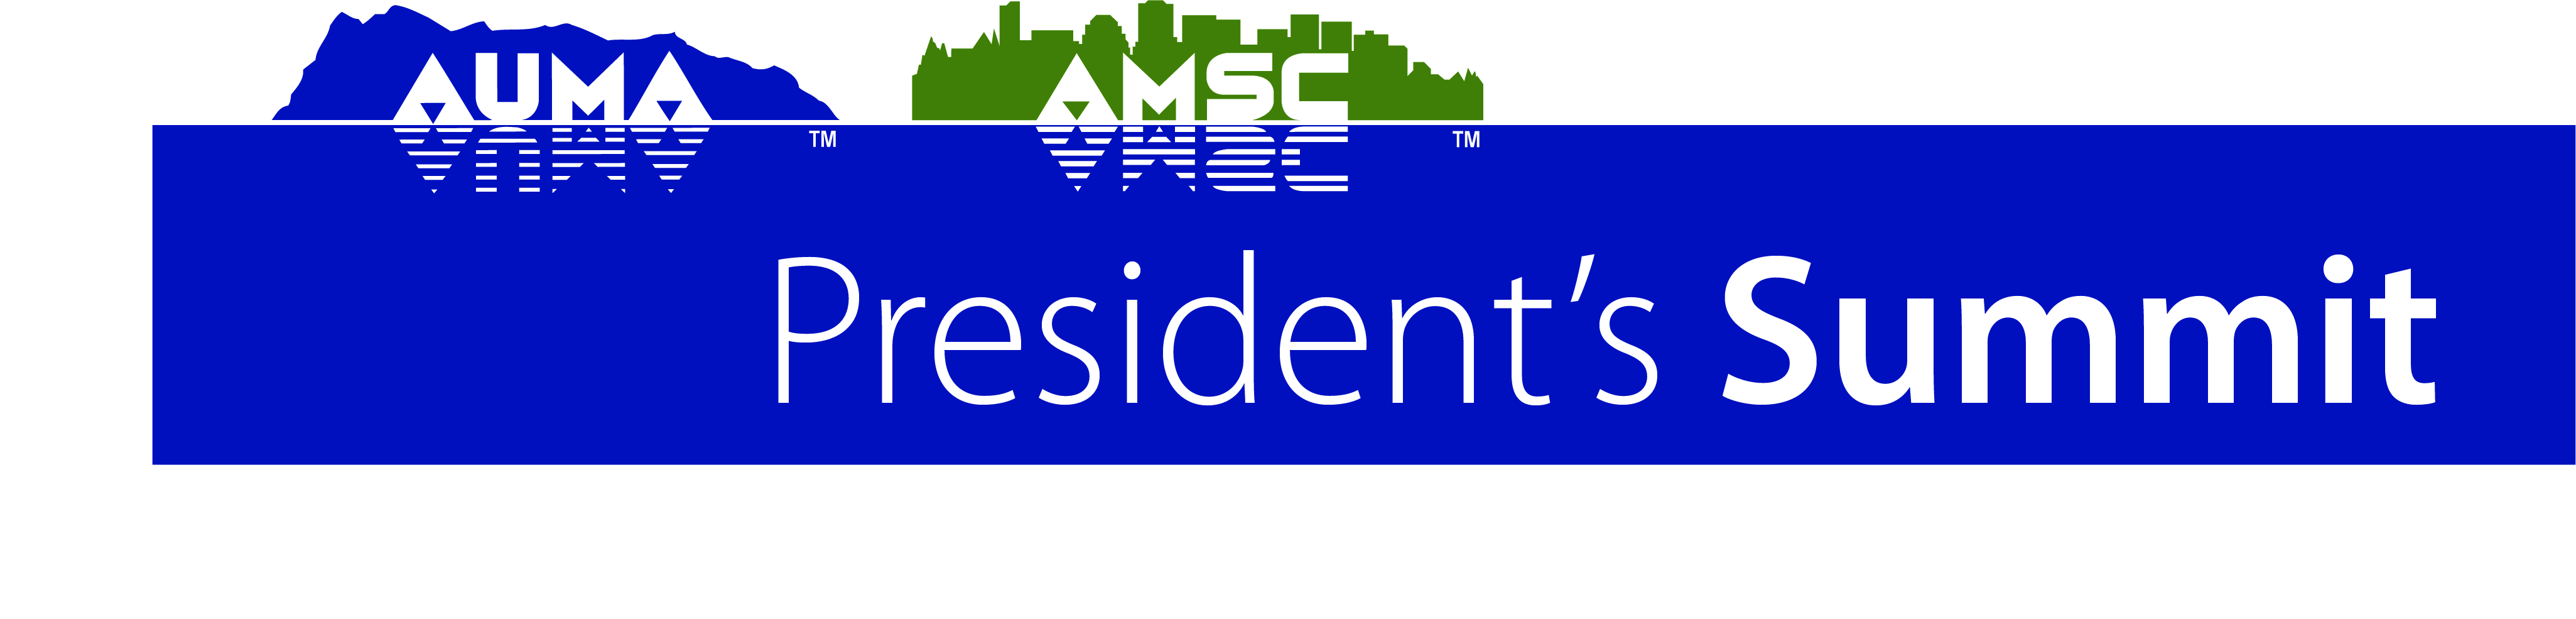 AUMA President's Summit on Municipal Finances: Transparent & Effective